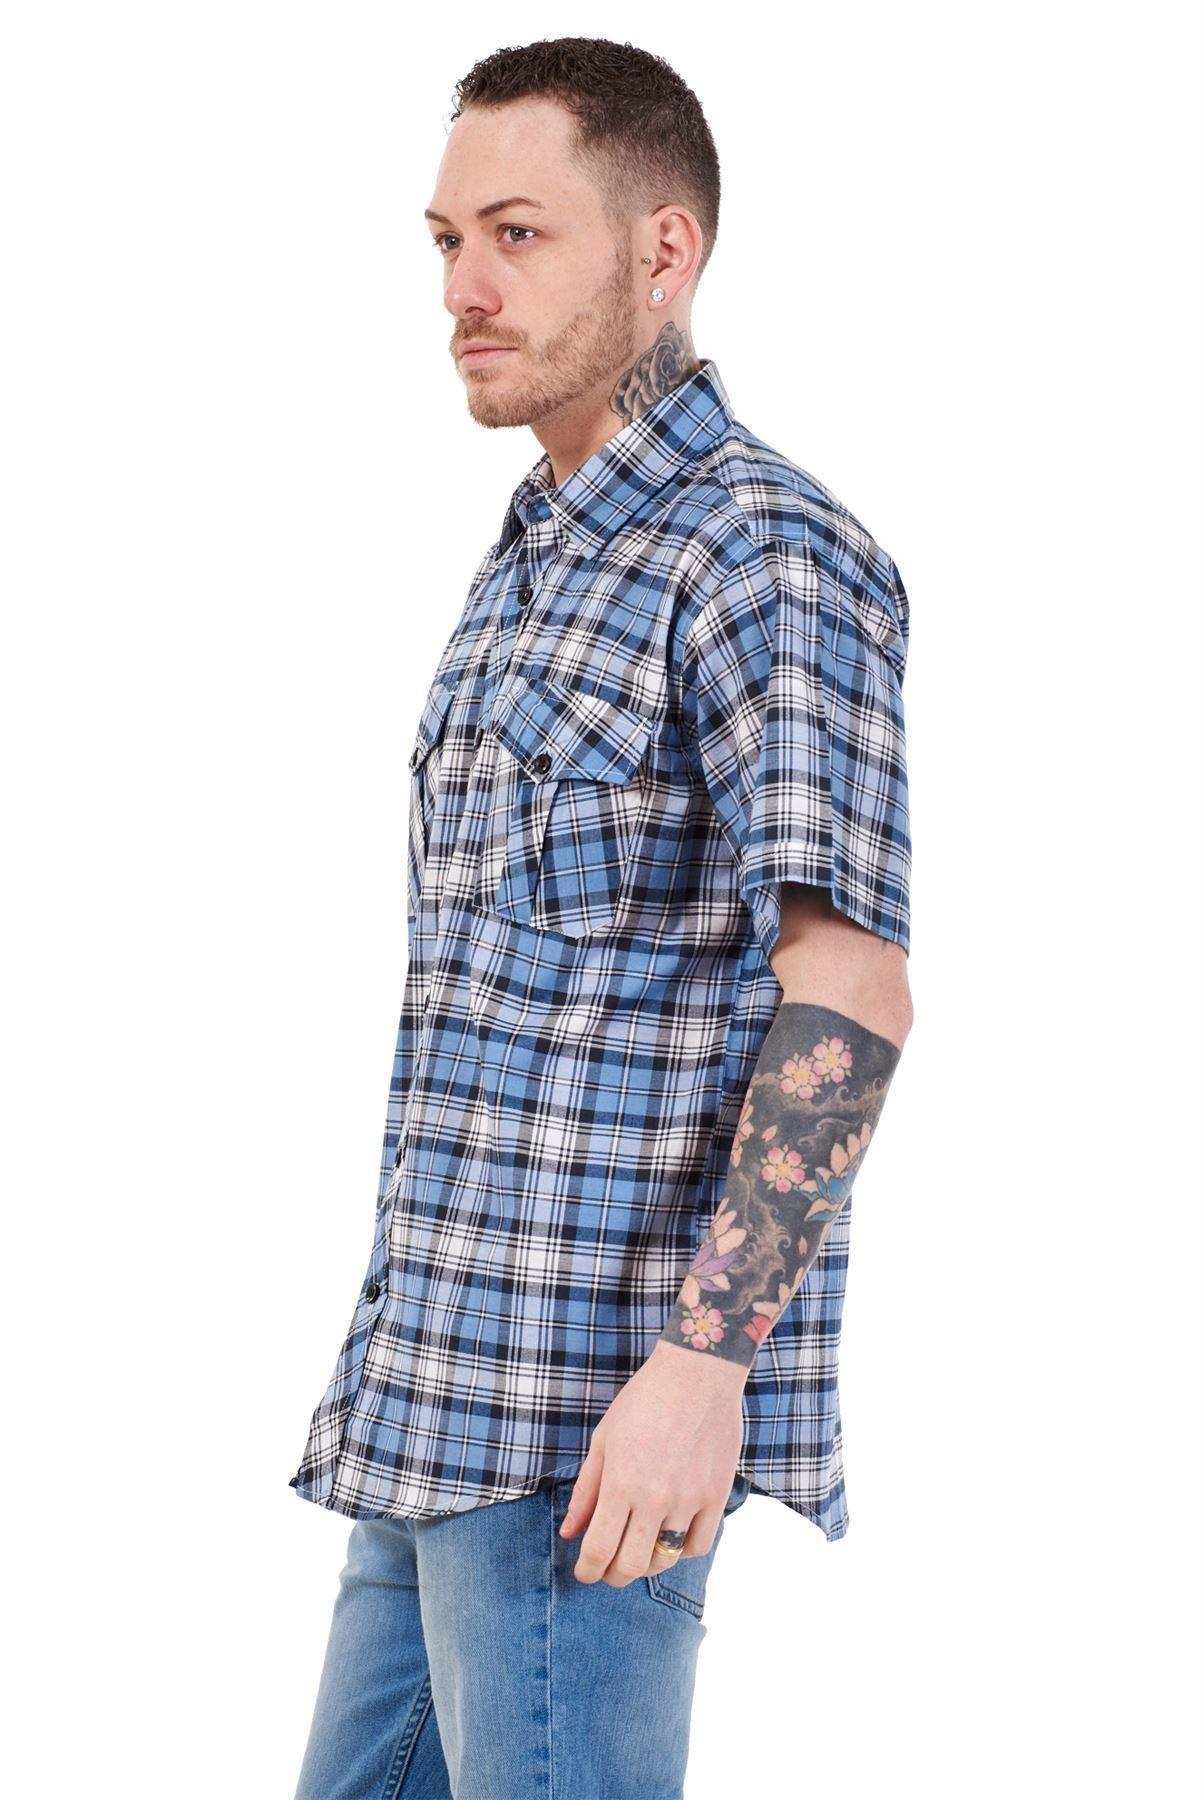 Mens-Regular-Big-Size-Shirts-Checked-Cotton-Blend-Casual-Short-Sleeve-Blue-M-5XL thumbnail 33